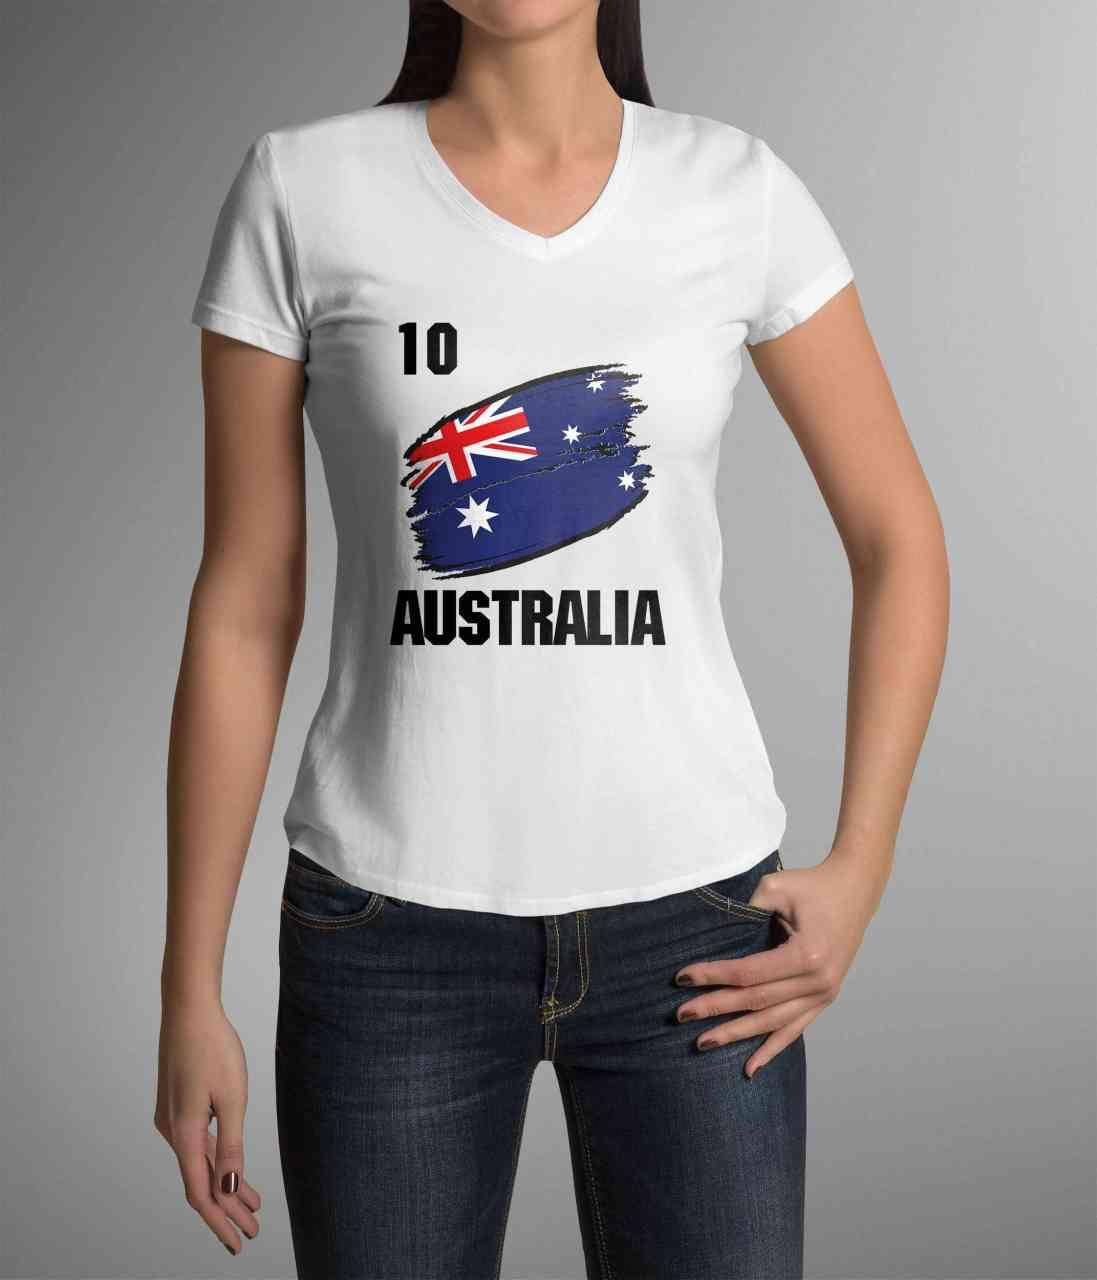 Australia | Australien | Männer oder Frauen Trikot T - Shirt mit Wunsch Nummer + Name | WM 2018